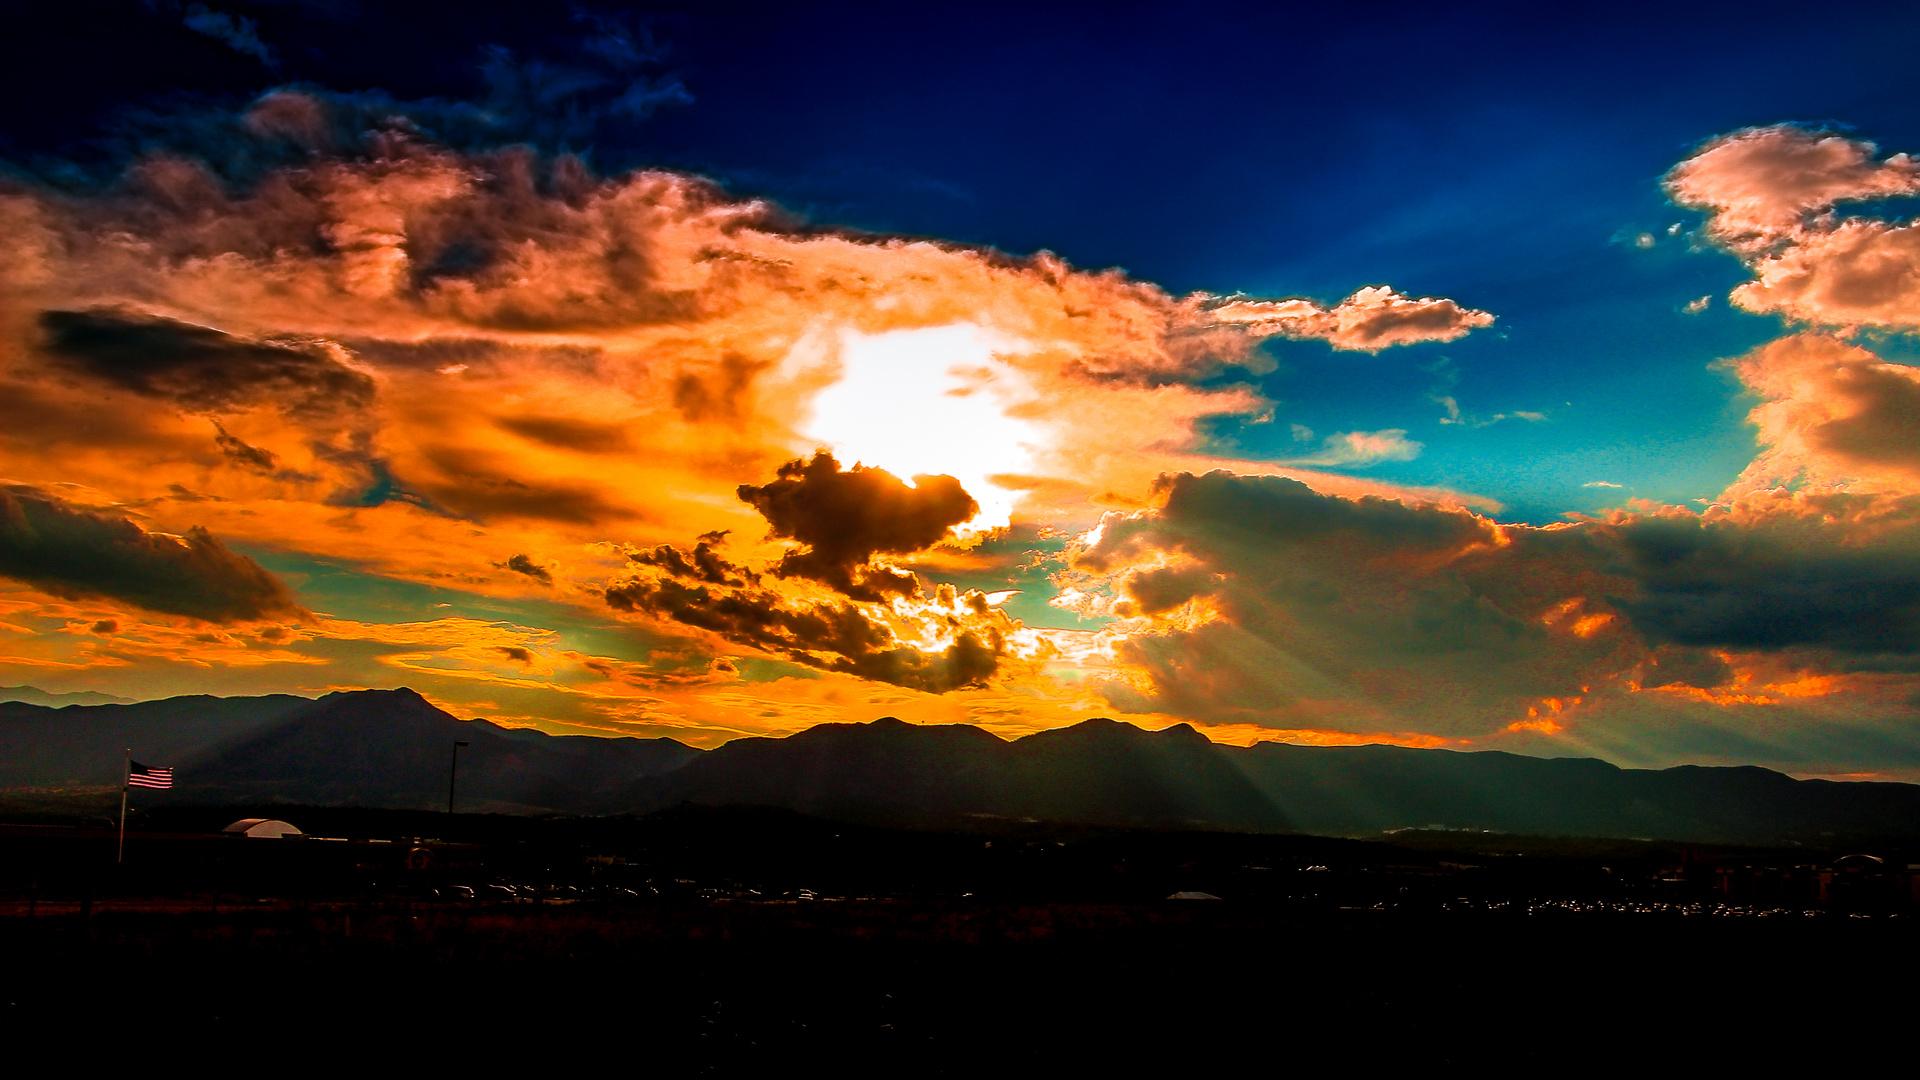 Sunset near the Rocky Mountains